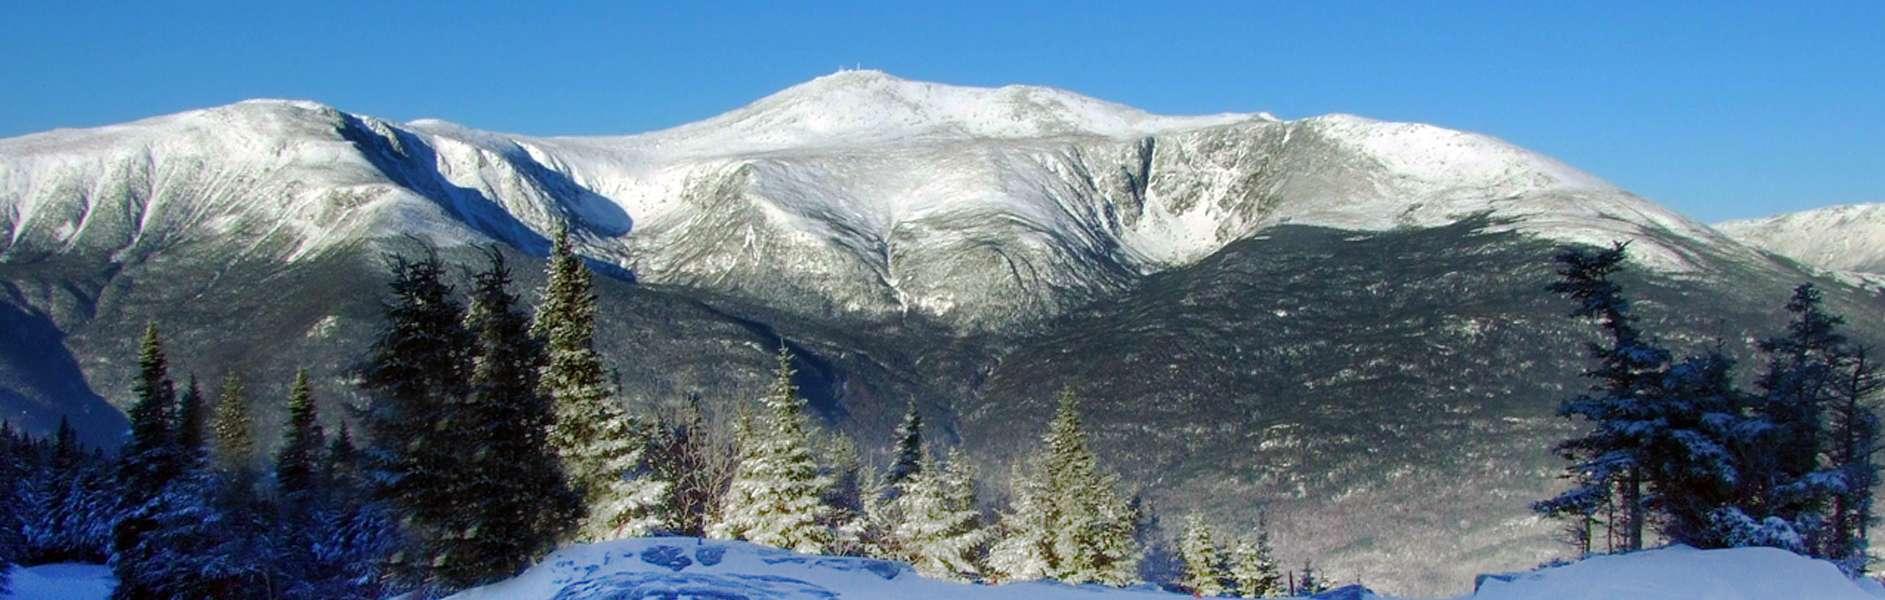 Explore Mount Washington Landing Page